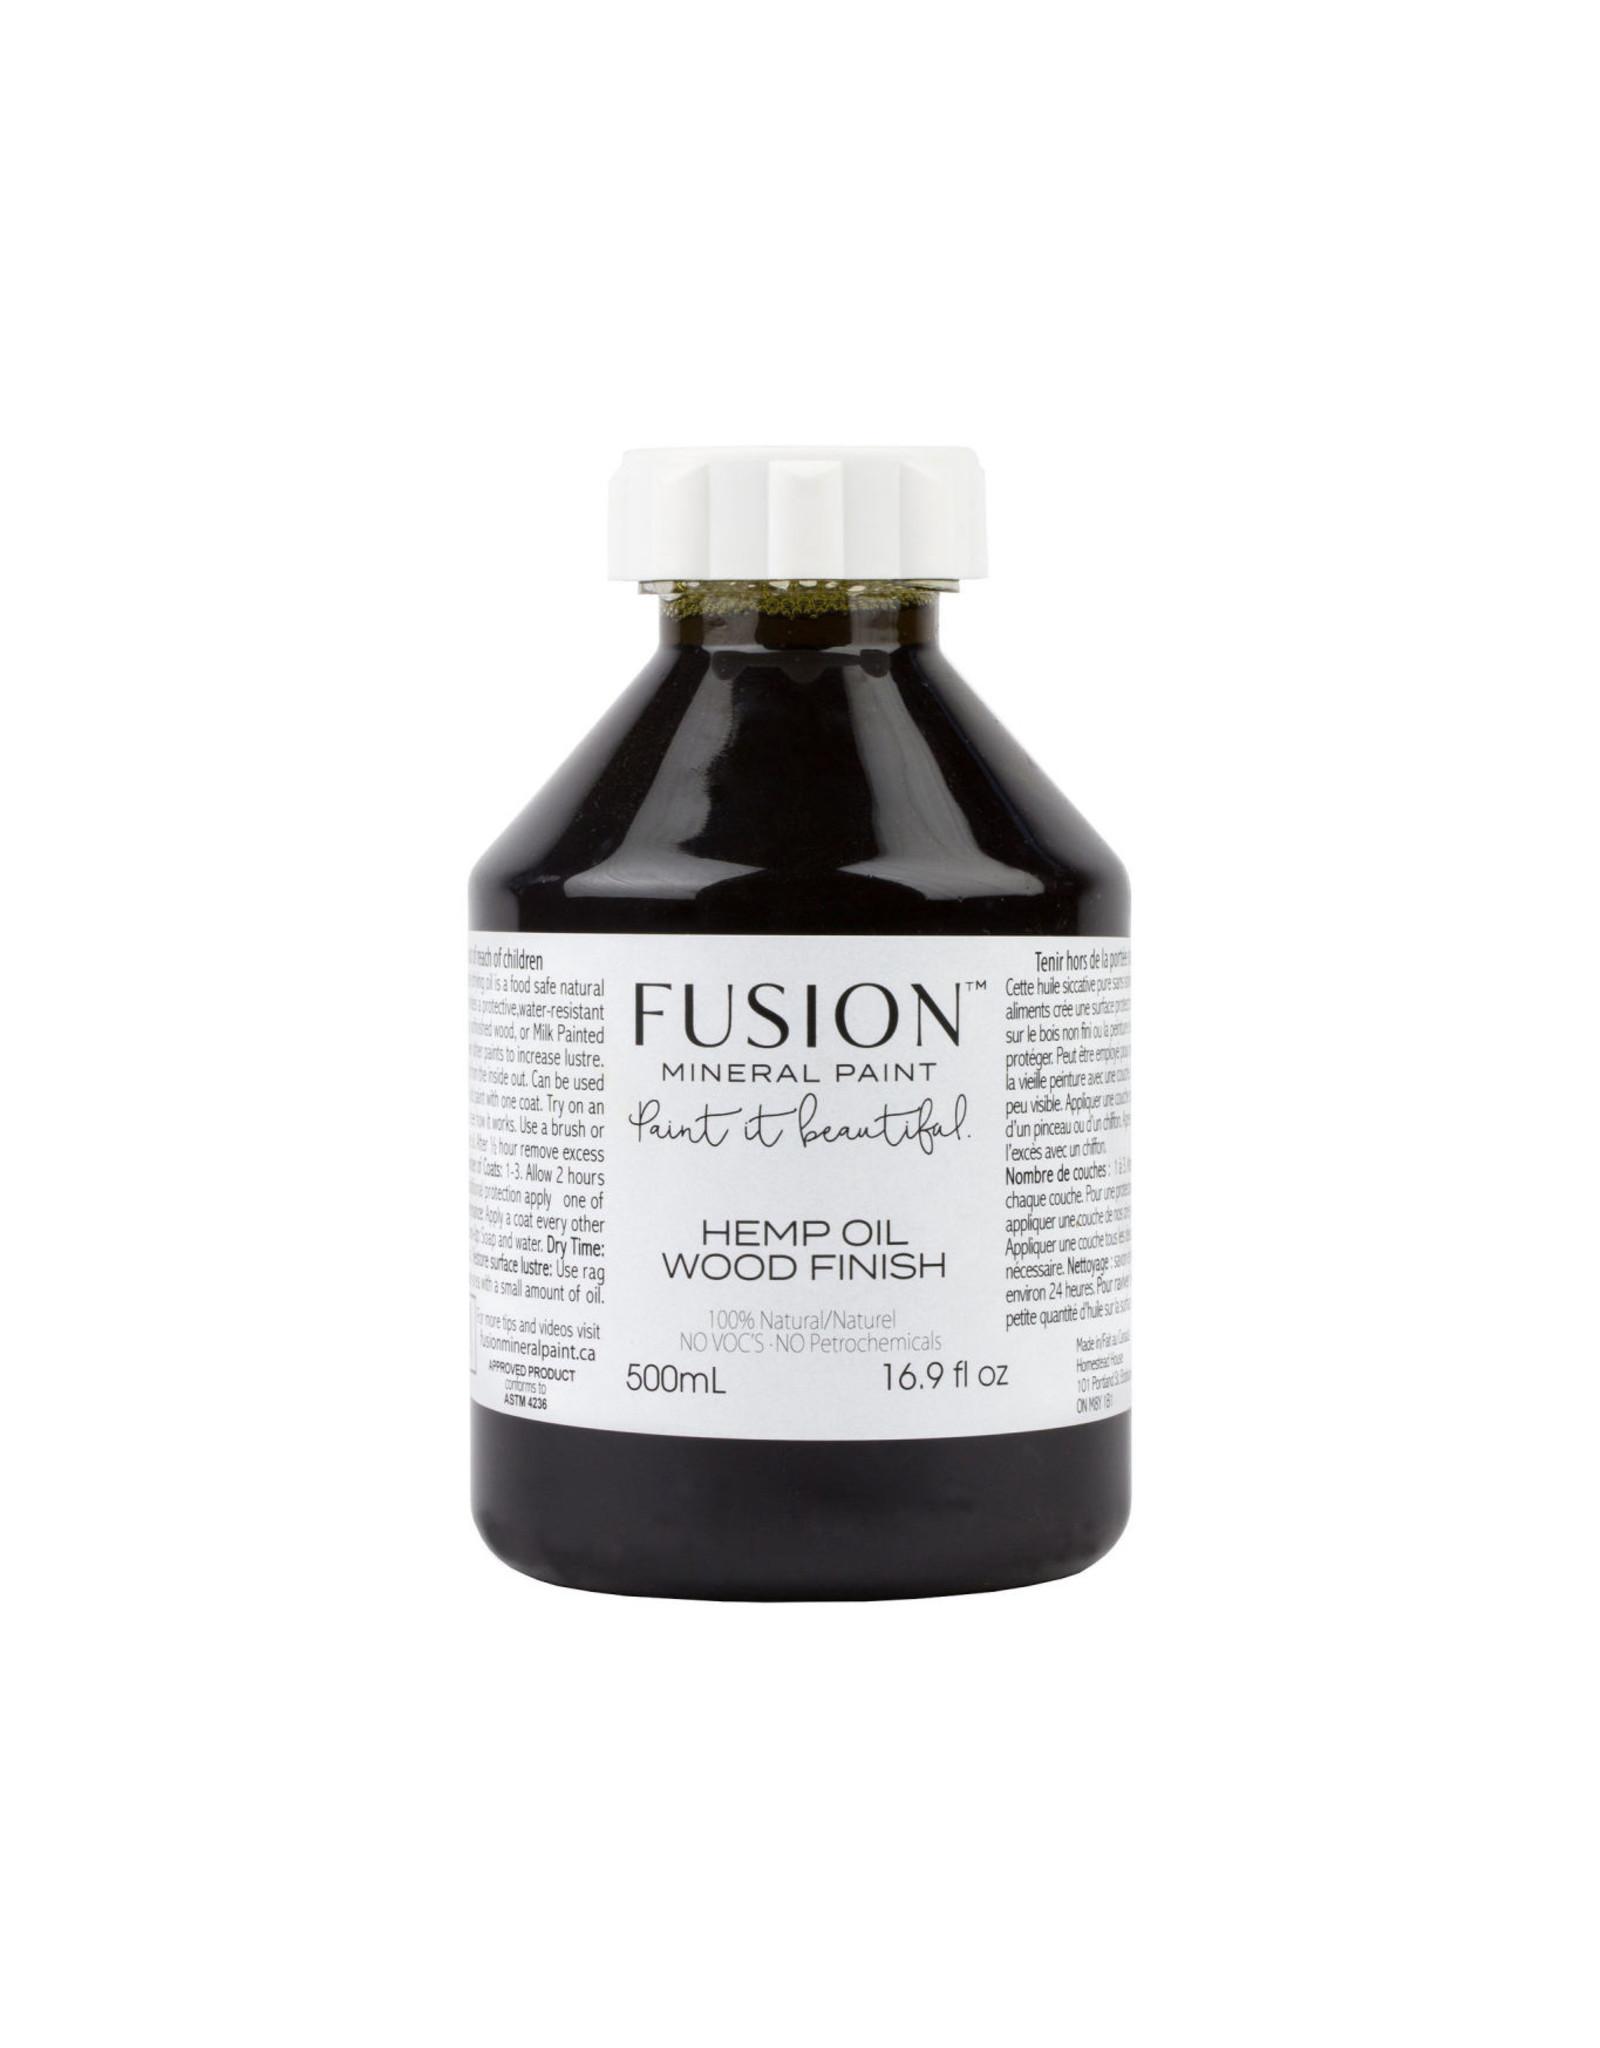 Fusion Mineral Paint Hemp Oil 500ml